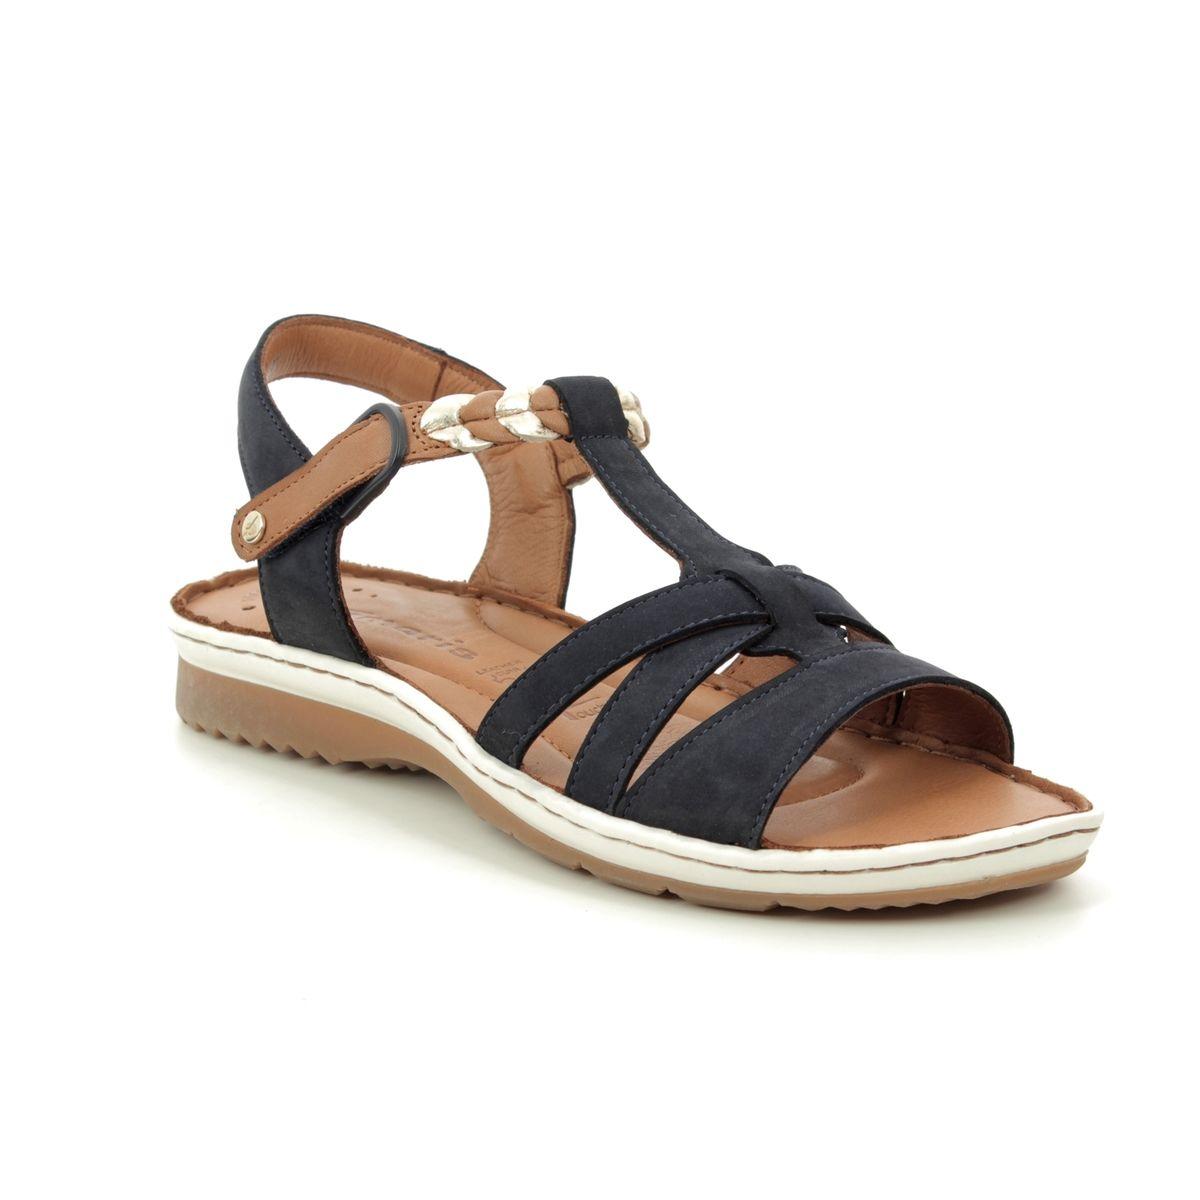 53deea0b6562 Tamaris Sandals - Navy leather - 28603/22/890 SALKA